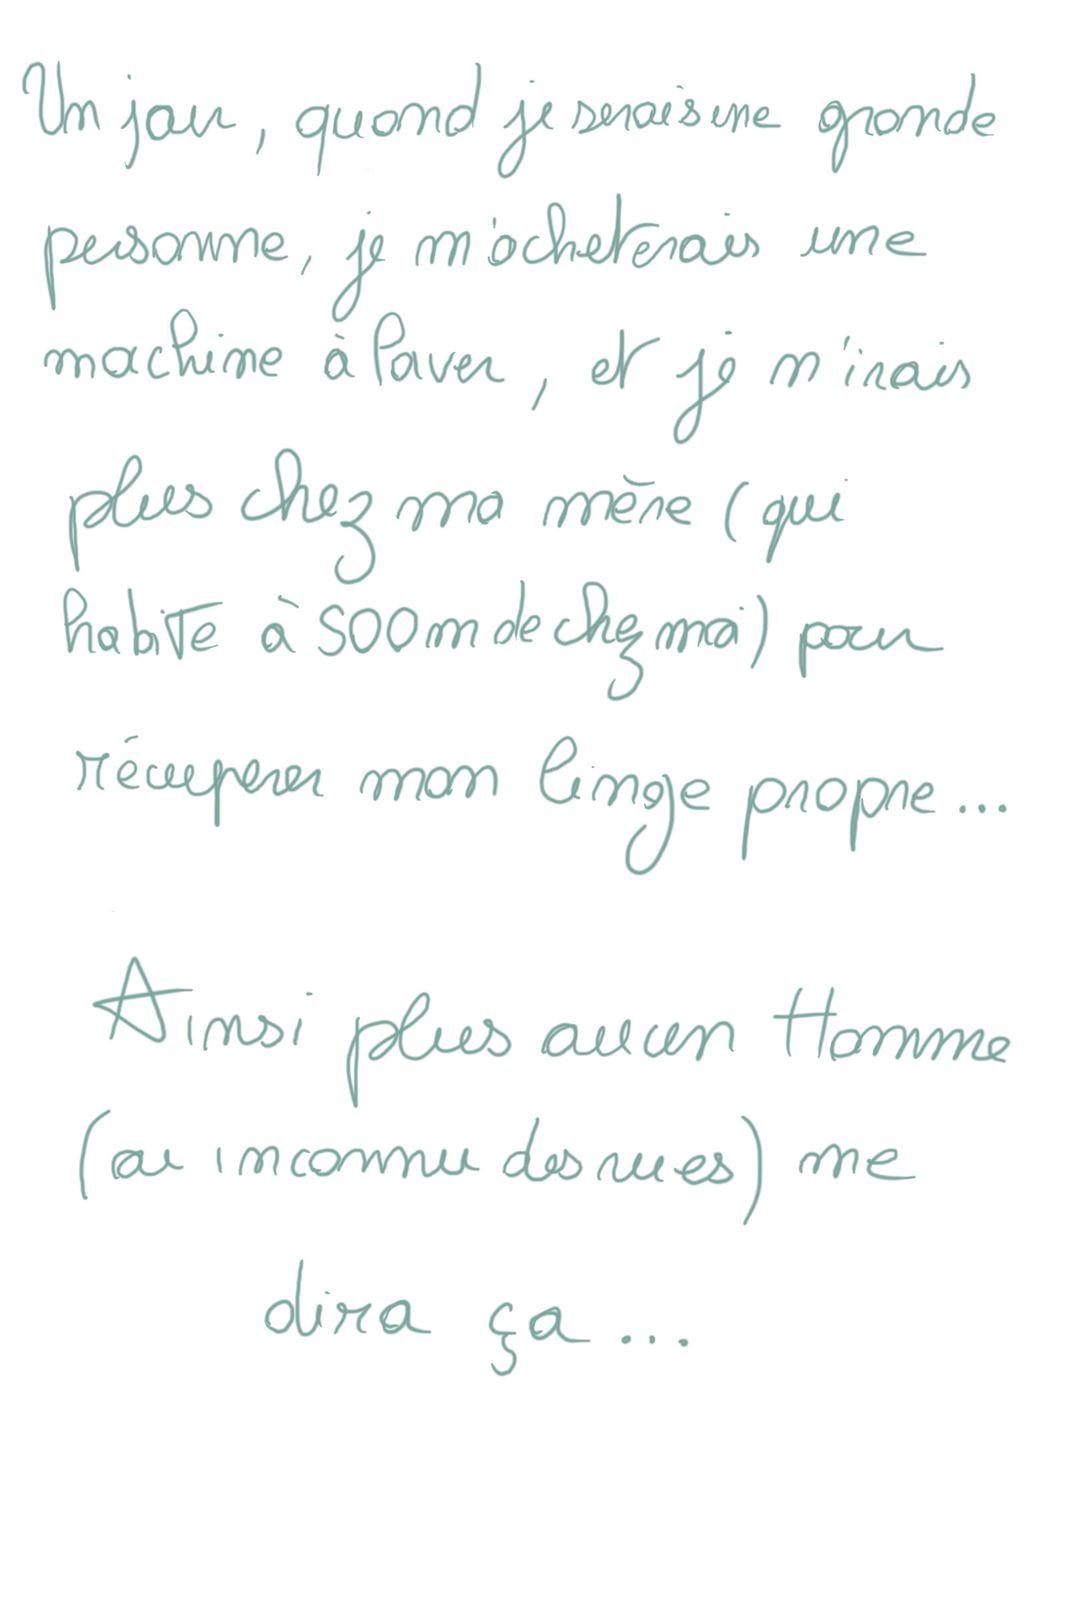 cherche-culotte-1.jpg